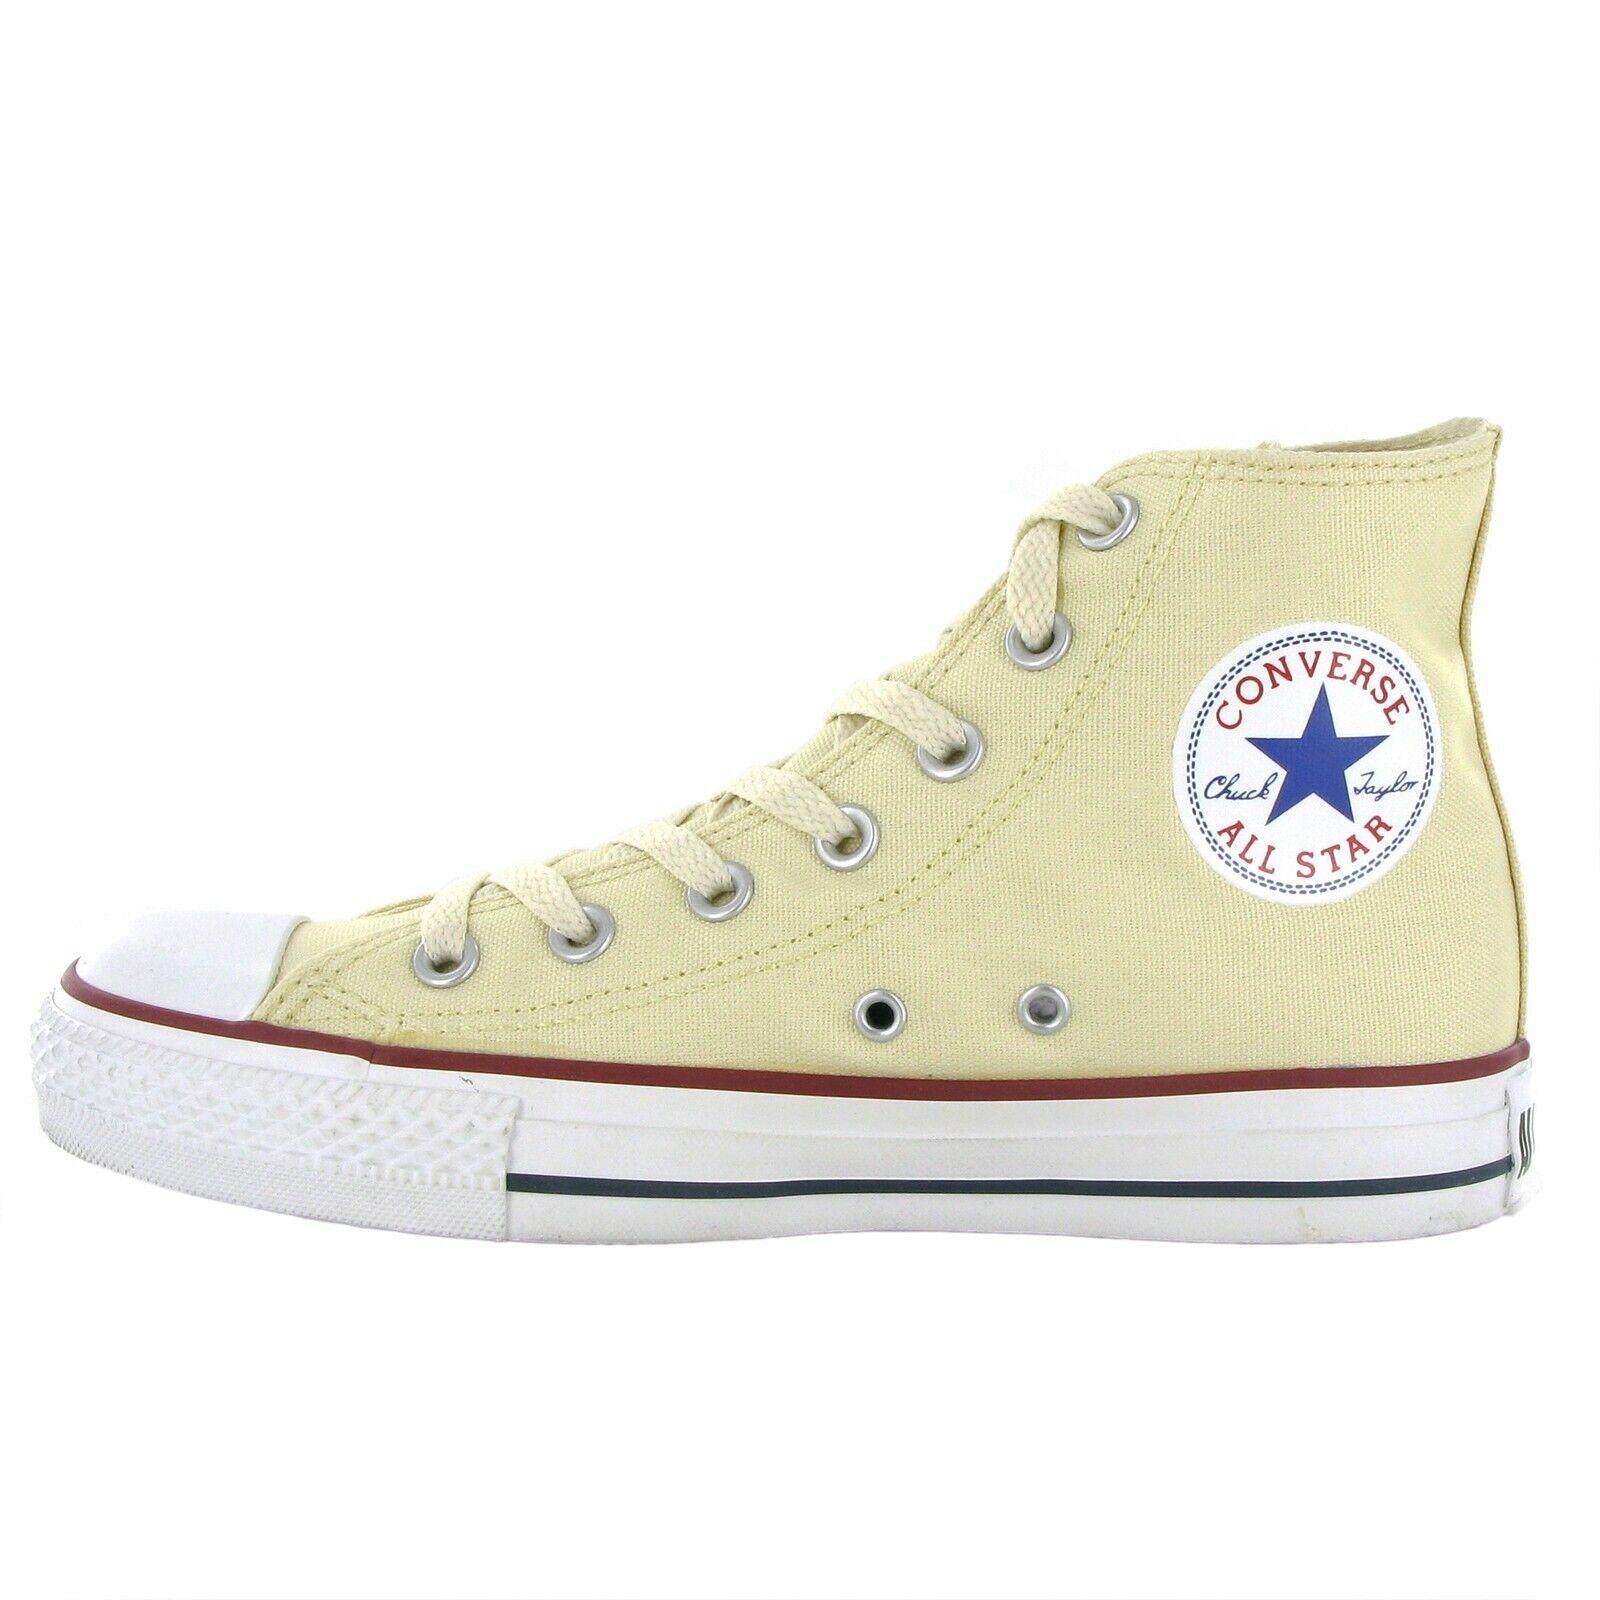 Zapatos Converse Chuck Taylor All Star M9162 _ amarillo Amarillo Unisex Hombre